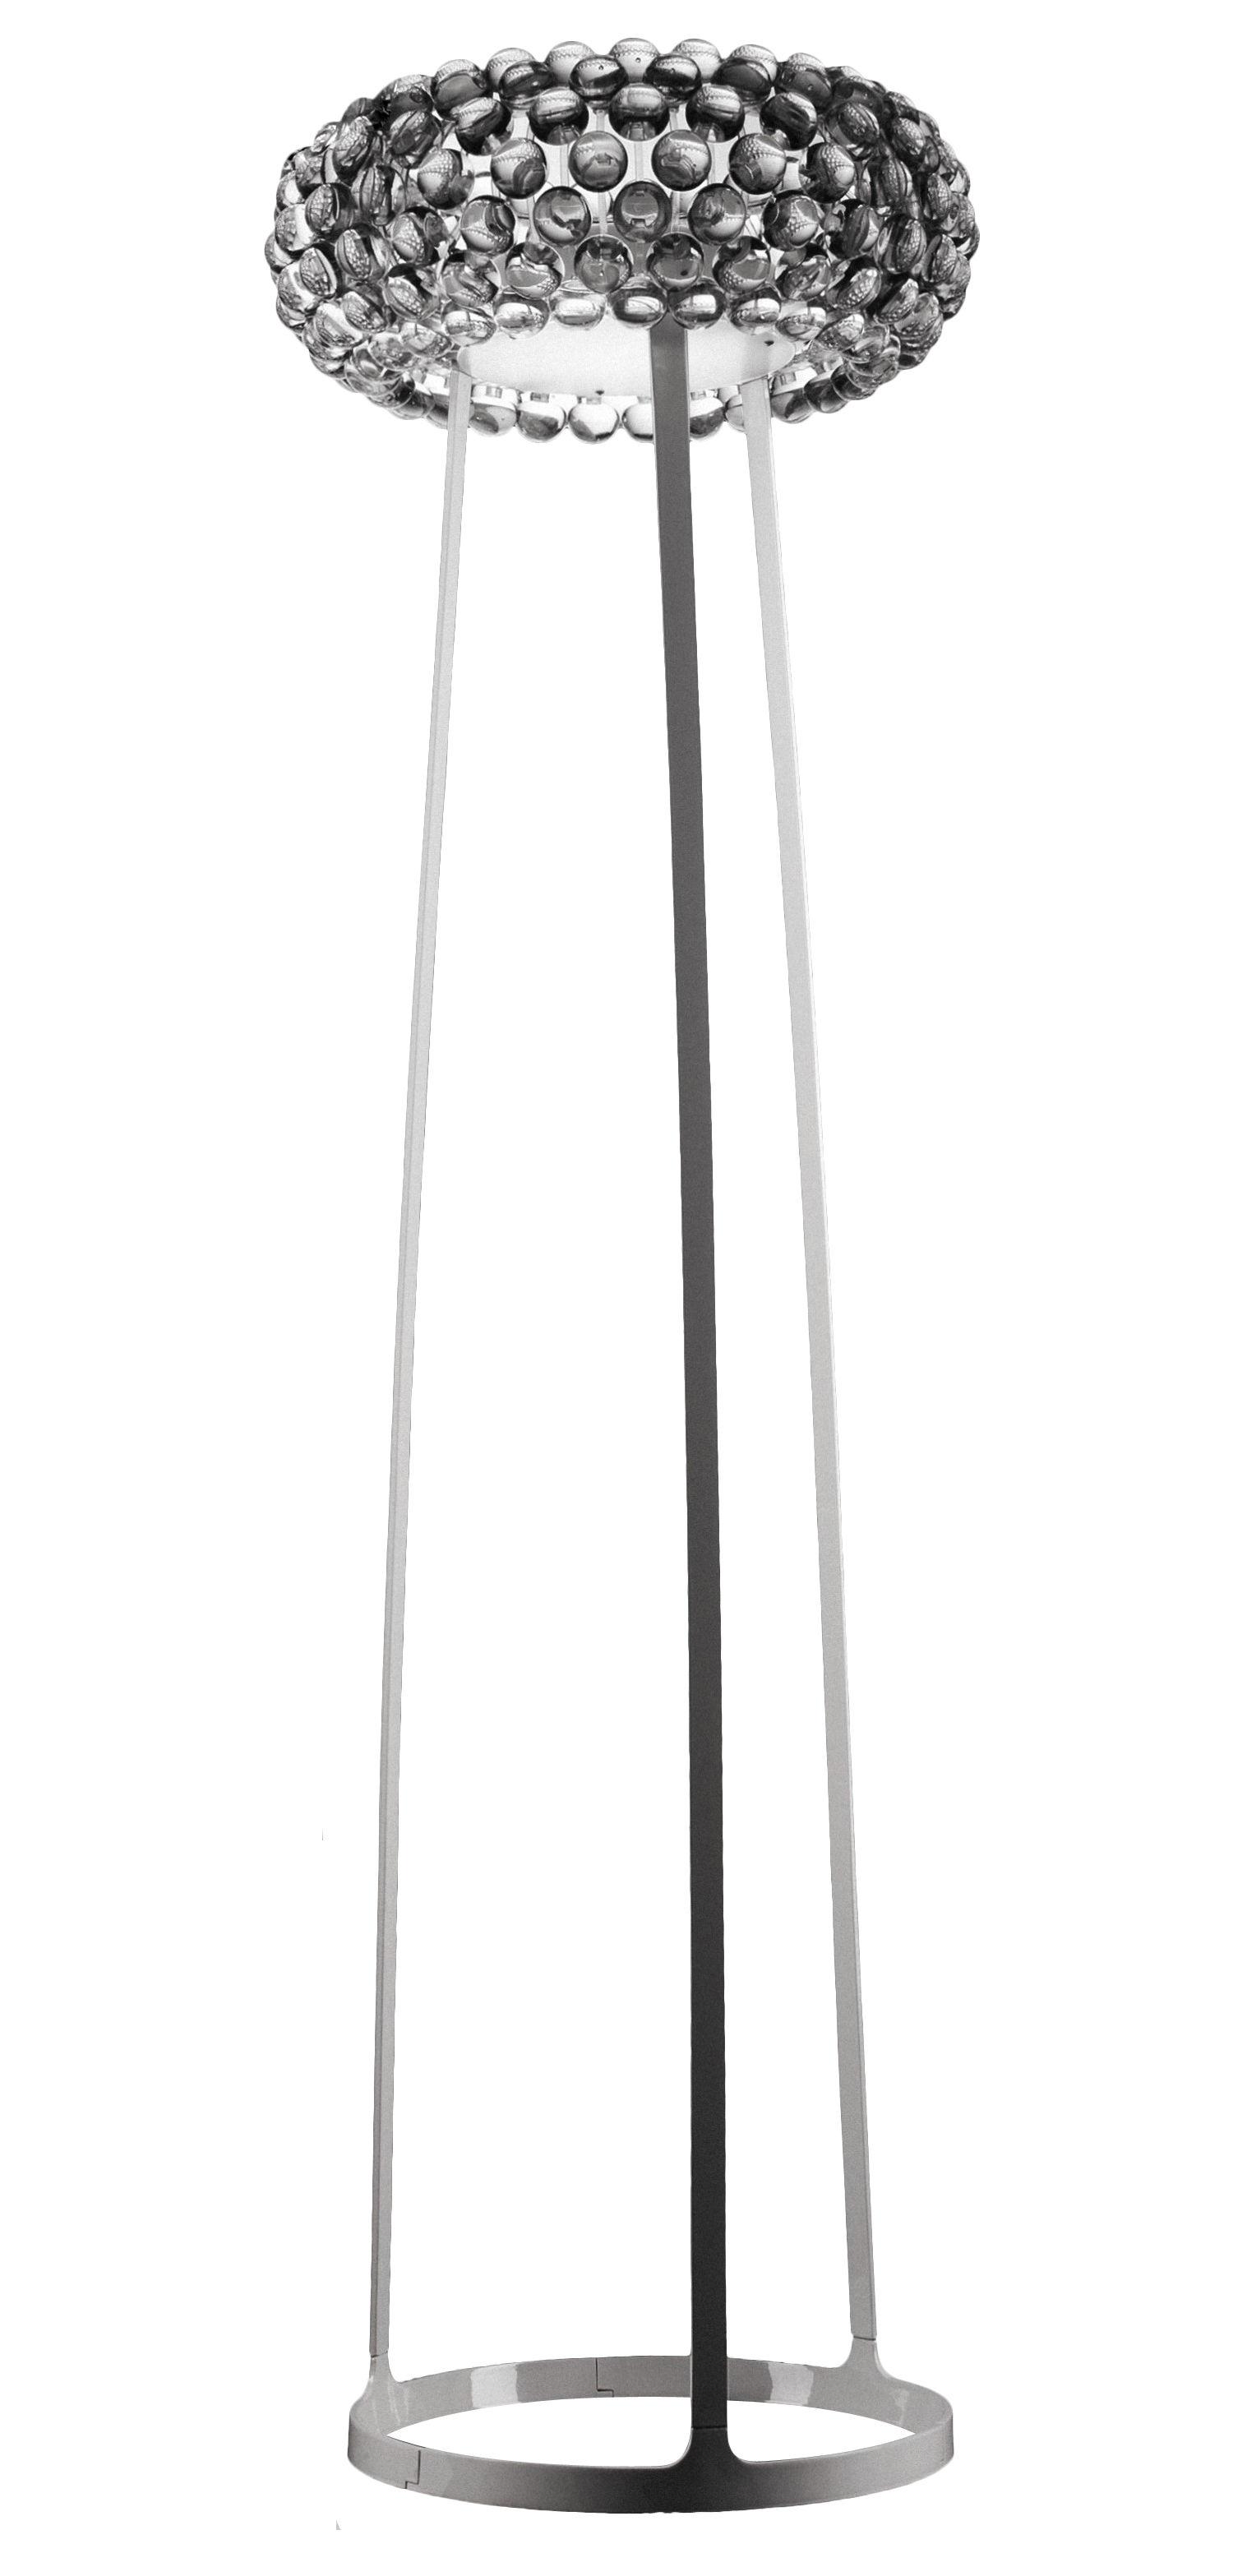 Luminaire - Lampadaires - Lampadaire Caboche Media / H 154 cm - Foscarini - Transparent - Métal, PMMA